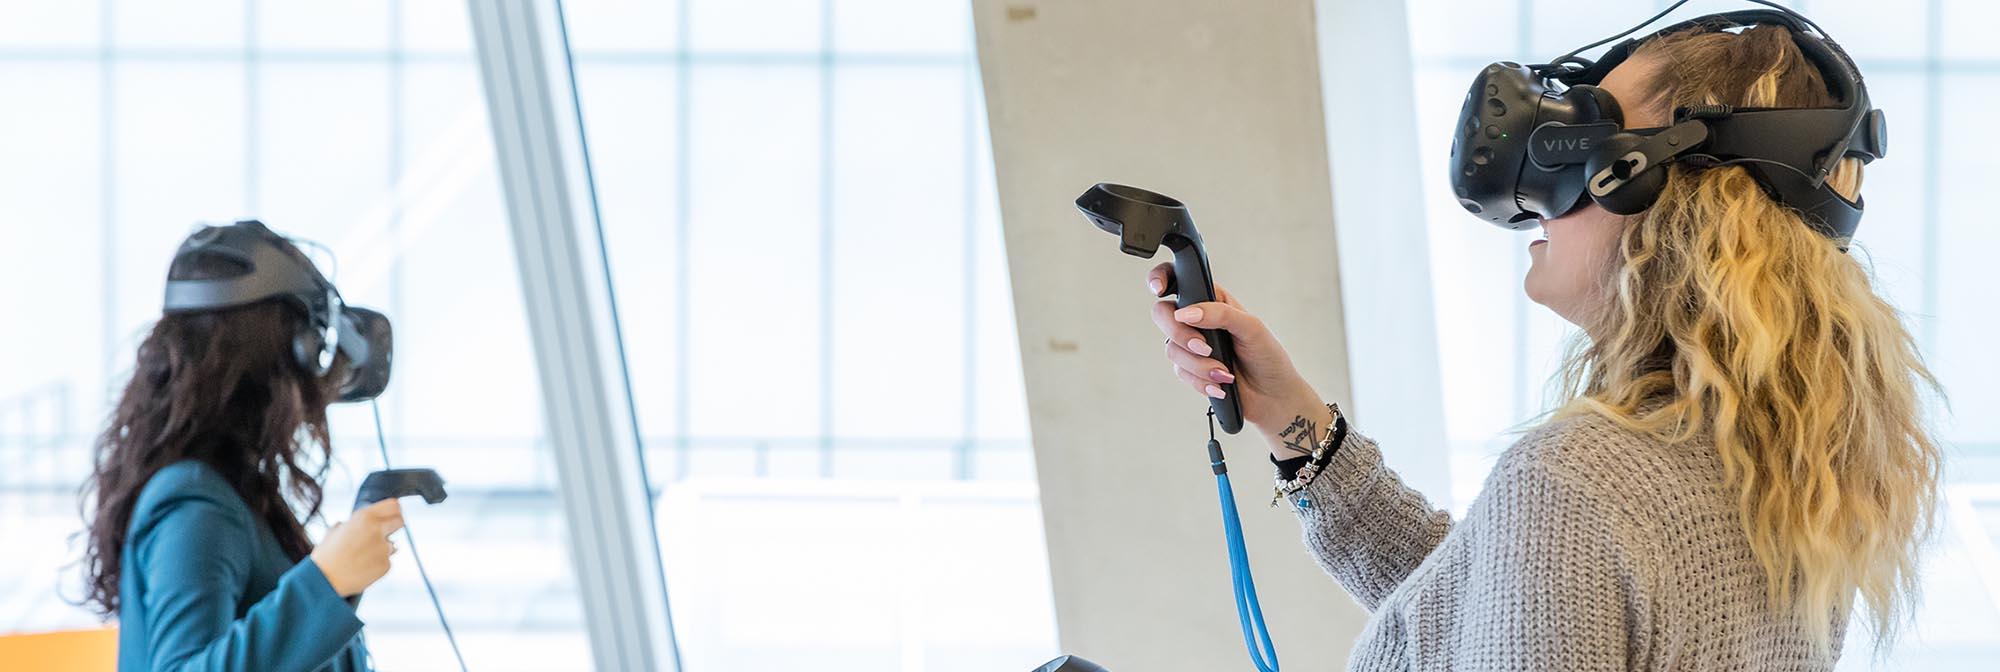 Two women wearing virtual reality headsets.